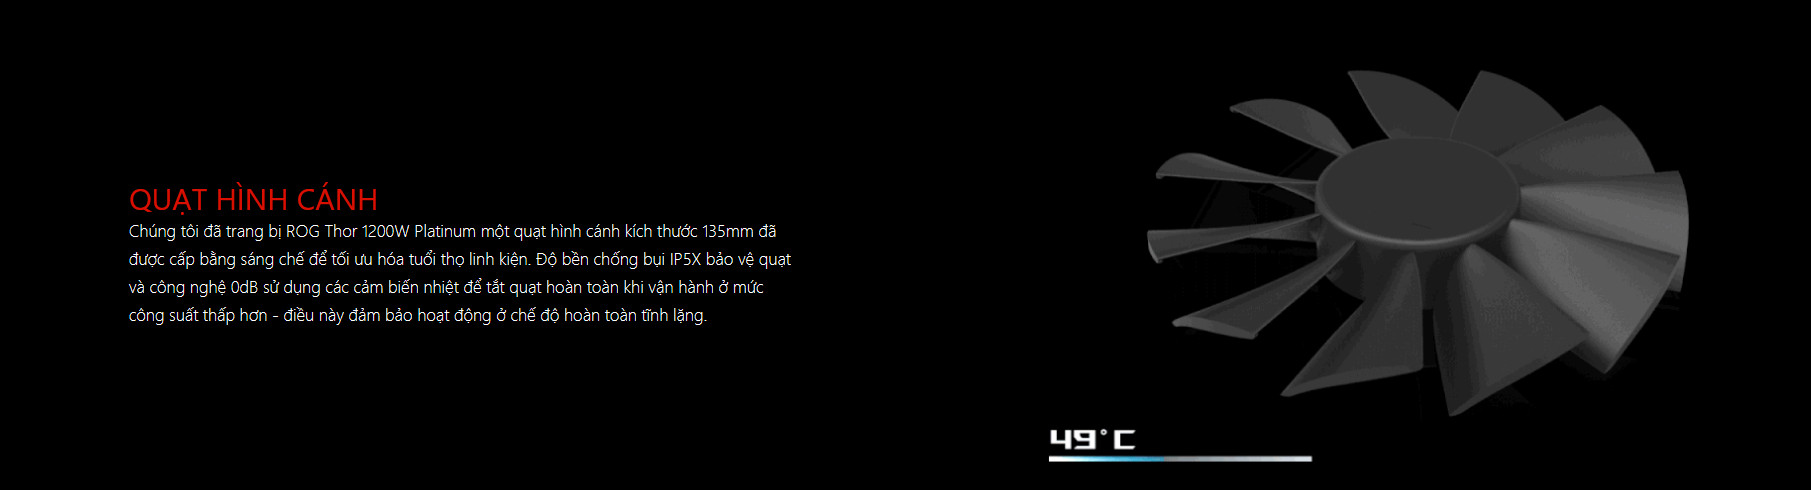 Nguồn Asus ROG Thor 1200W Platinum - RGB 1200W 80 Plus Platinum Full Modular thiết kế fan tản nhiệt